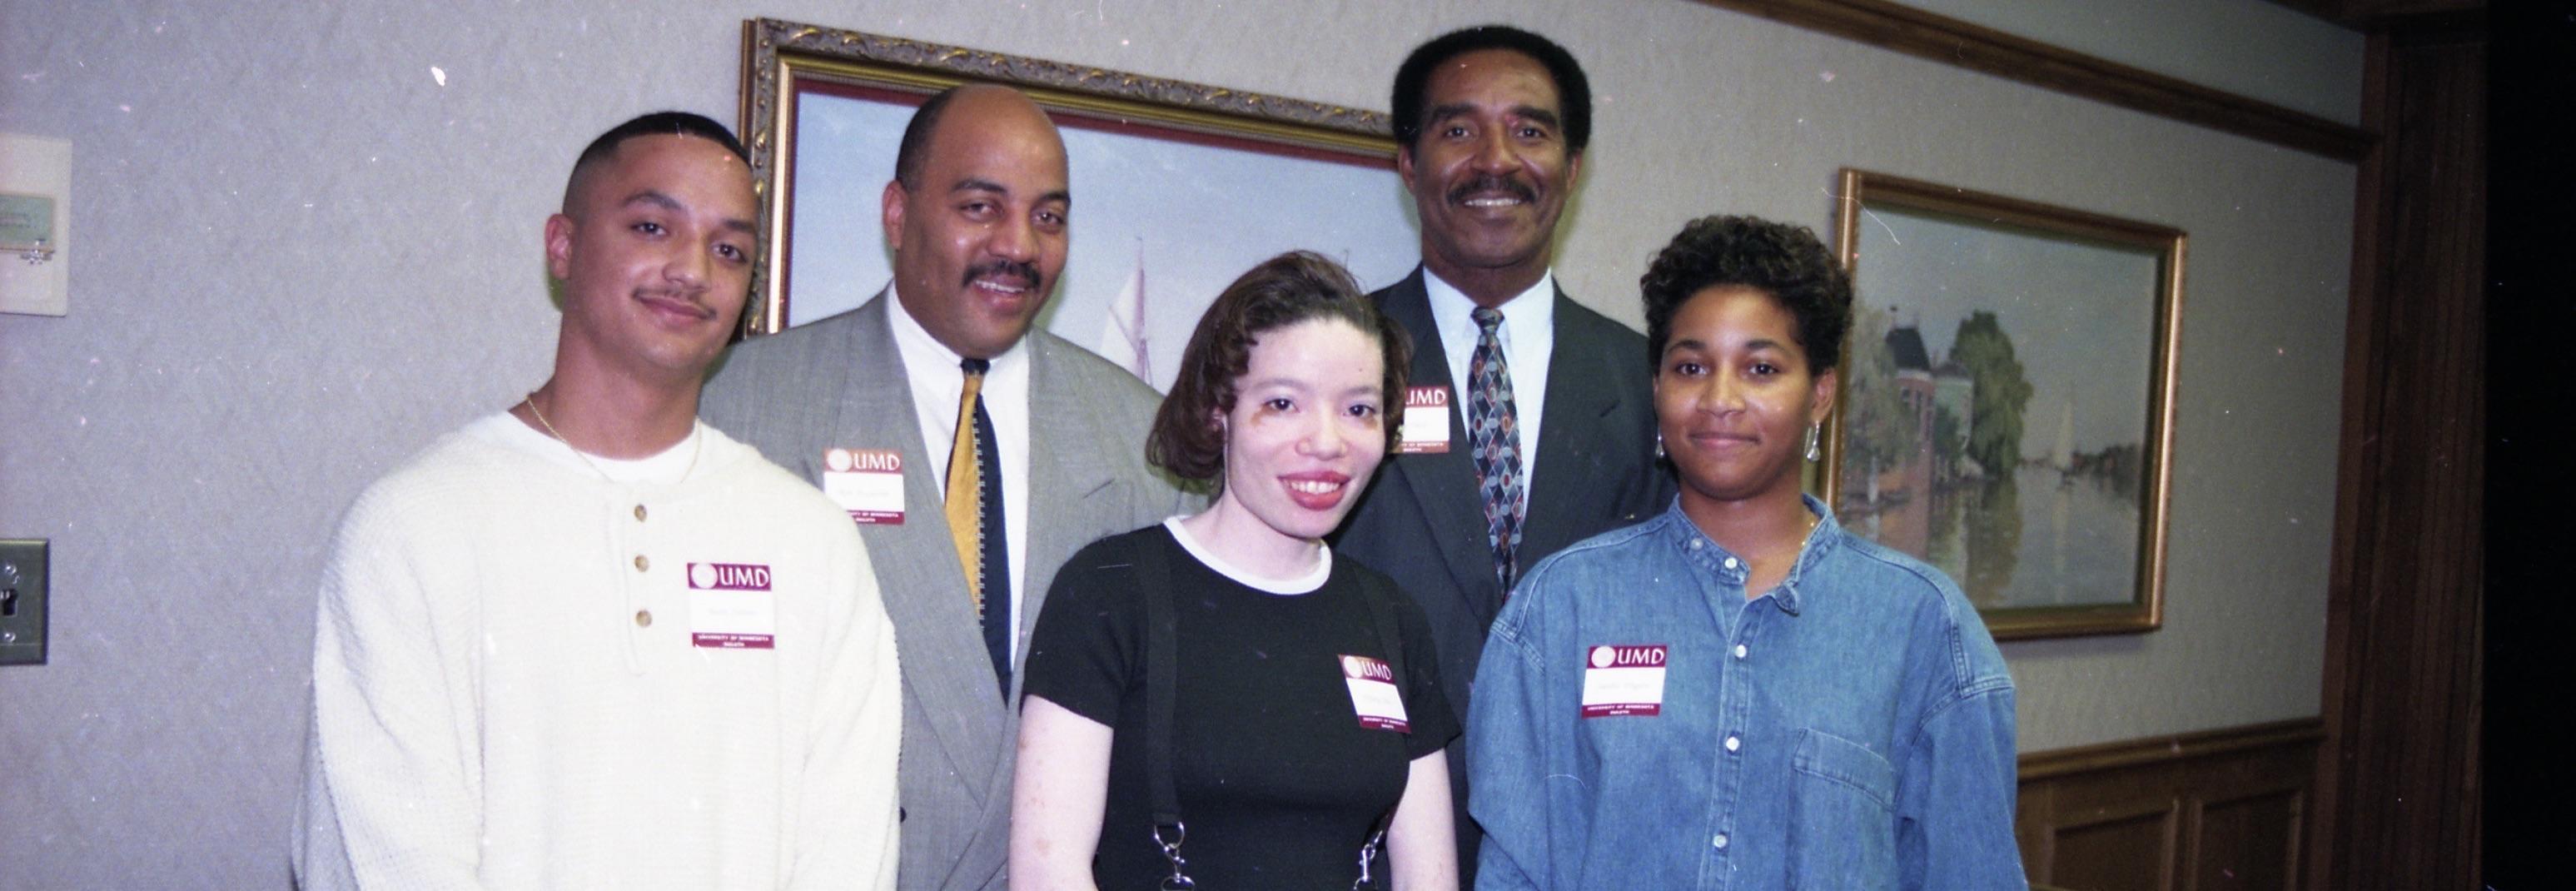 1994 scholarships